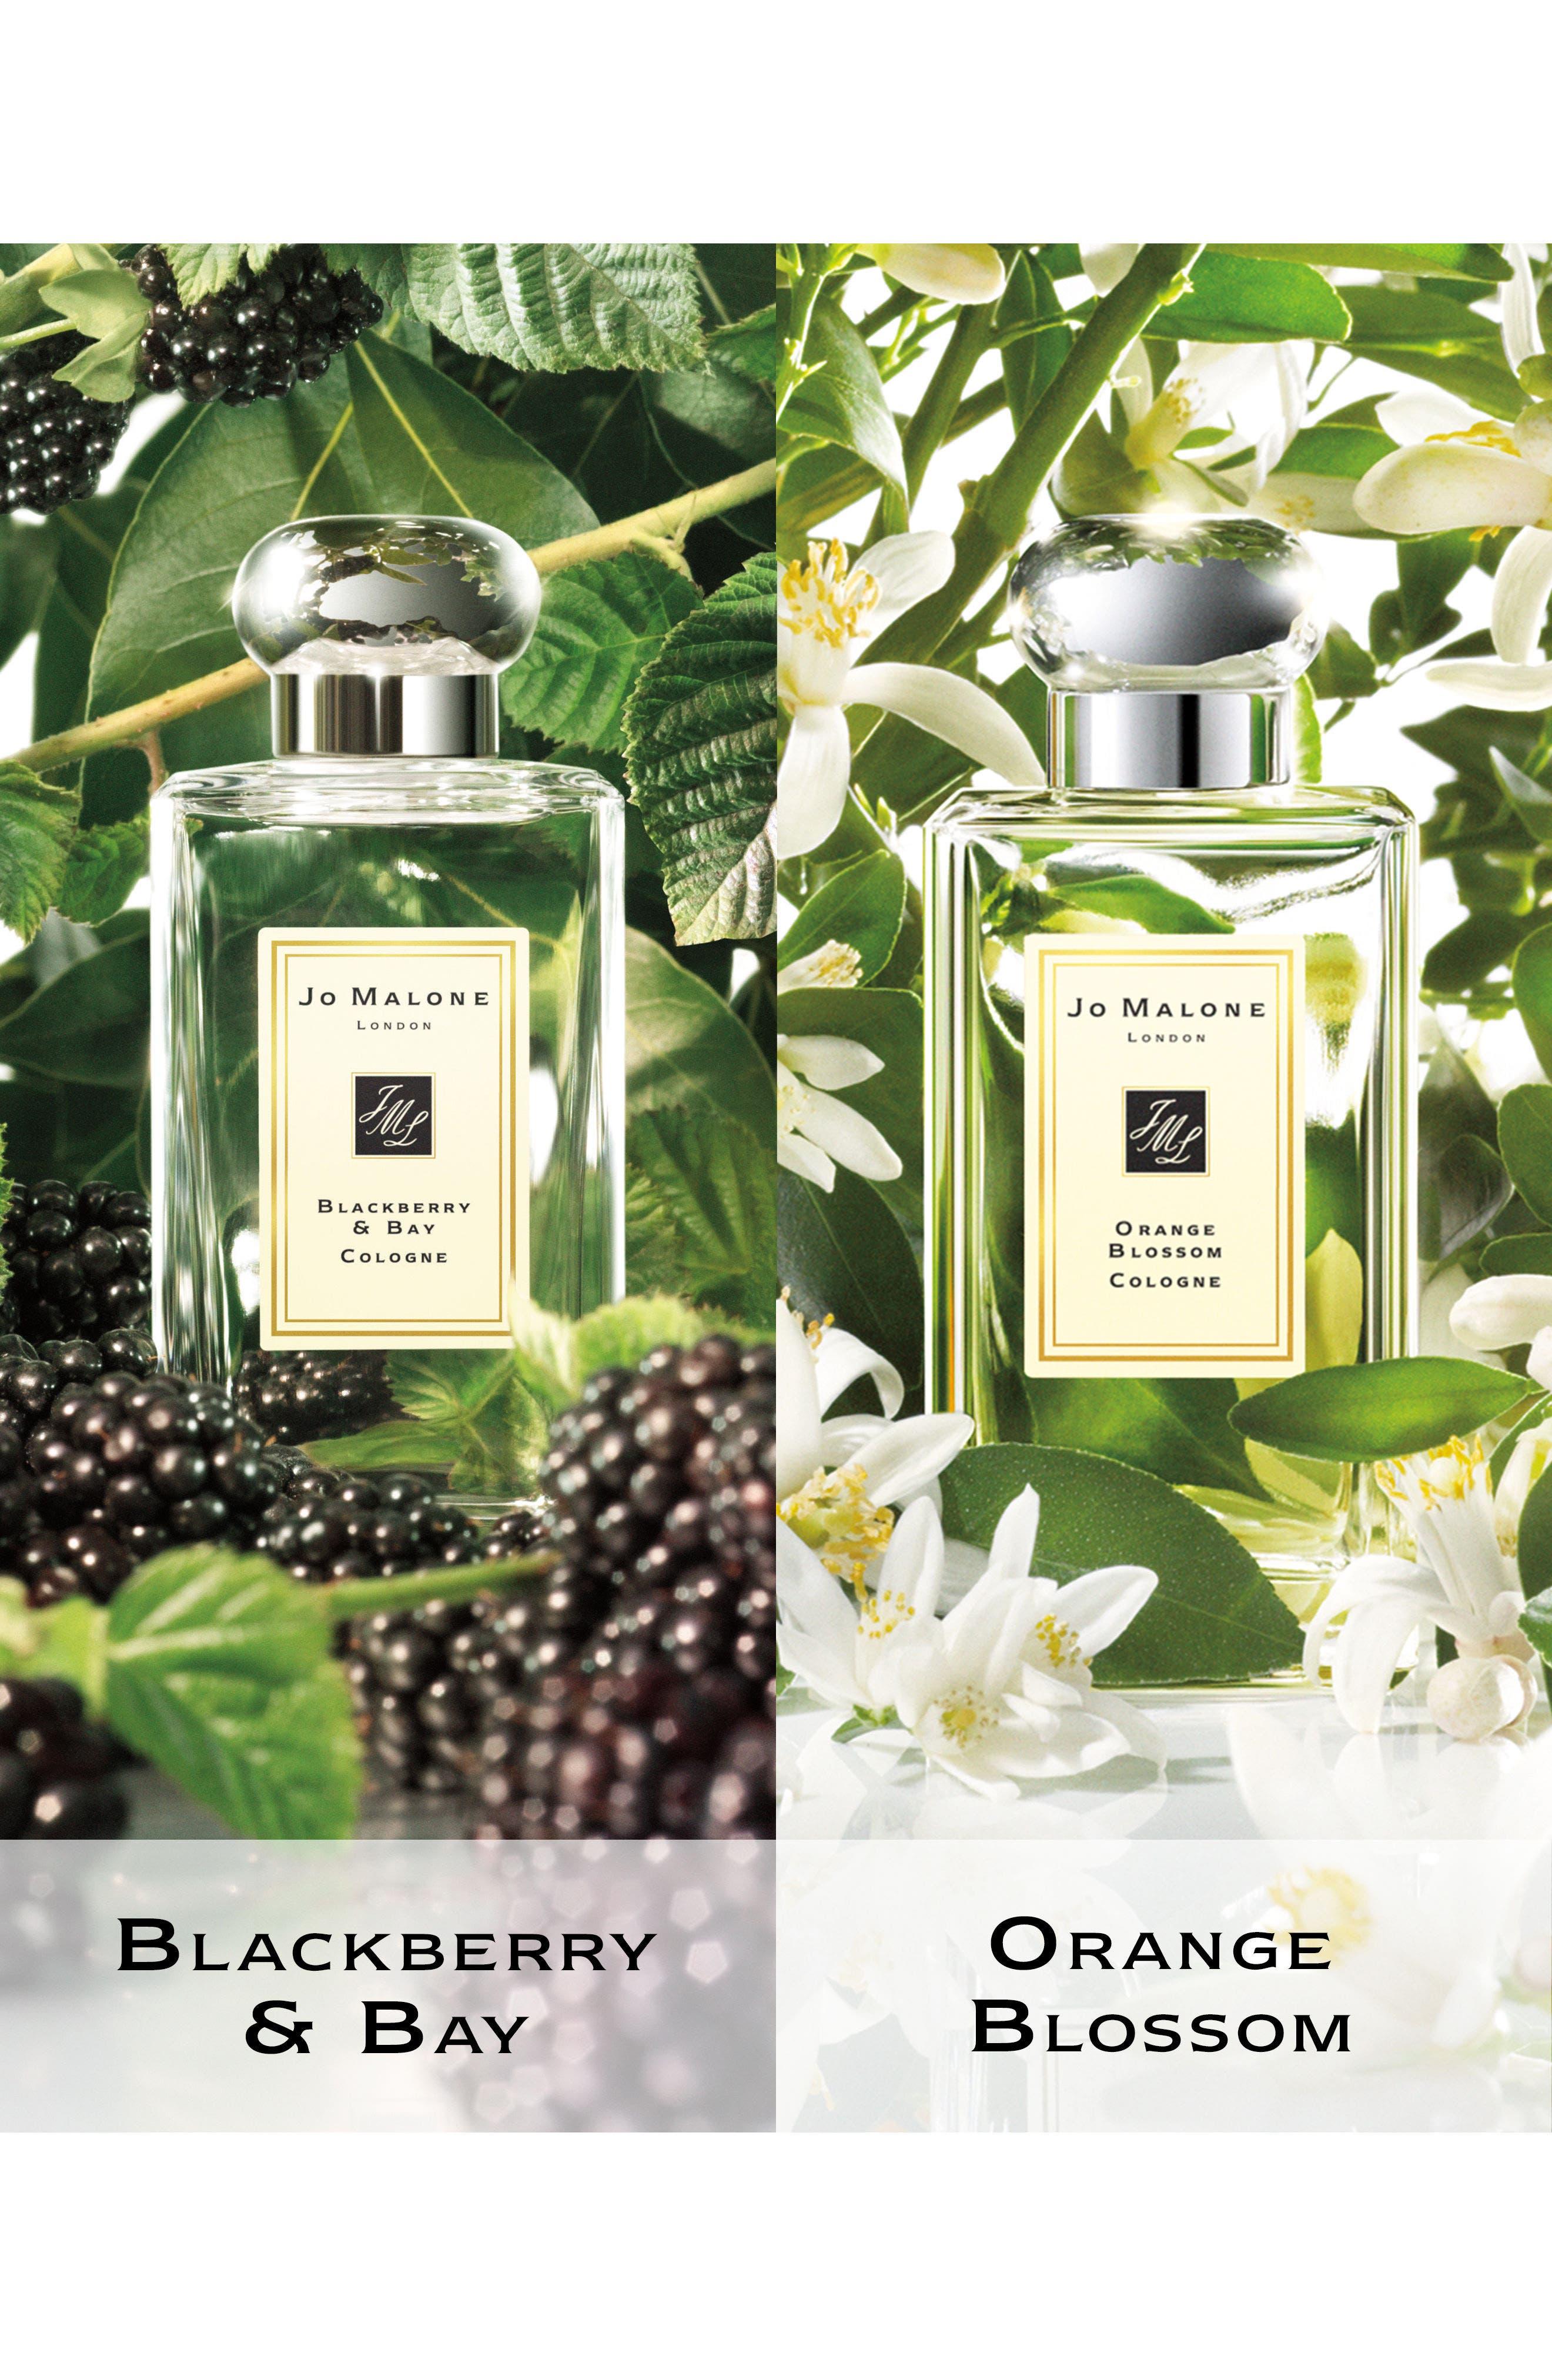 Jo Malone London™ Blackberry & Bay & Orange Blossom